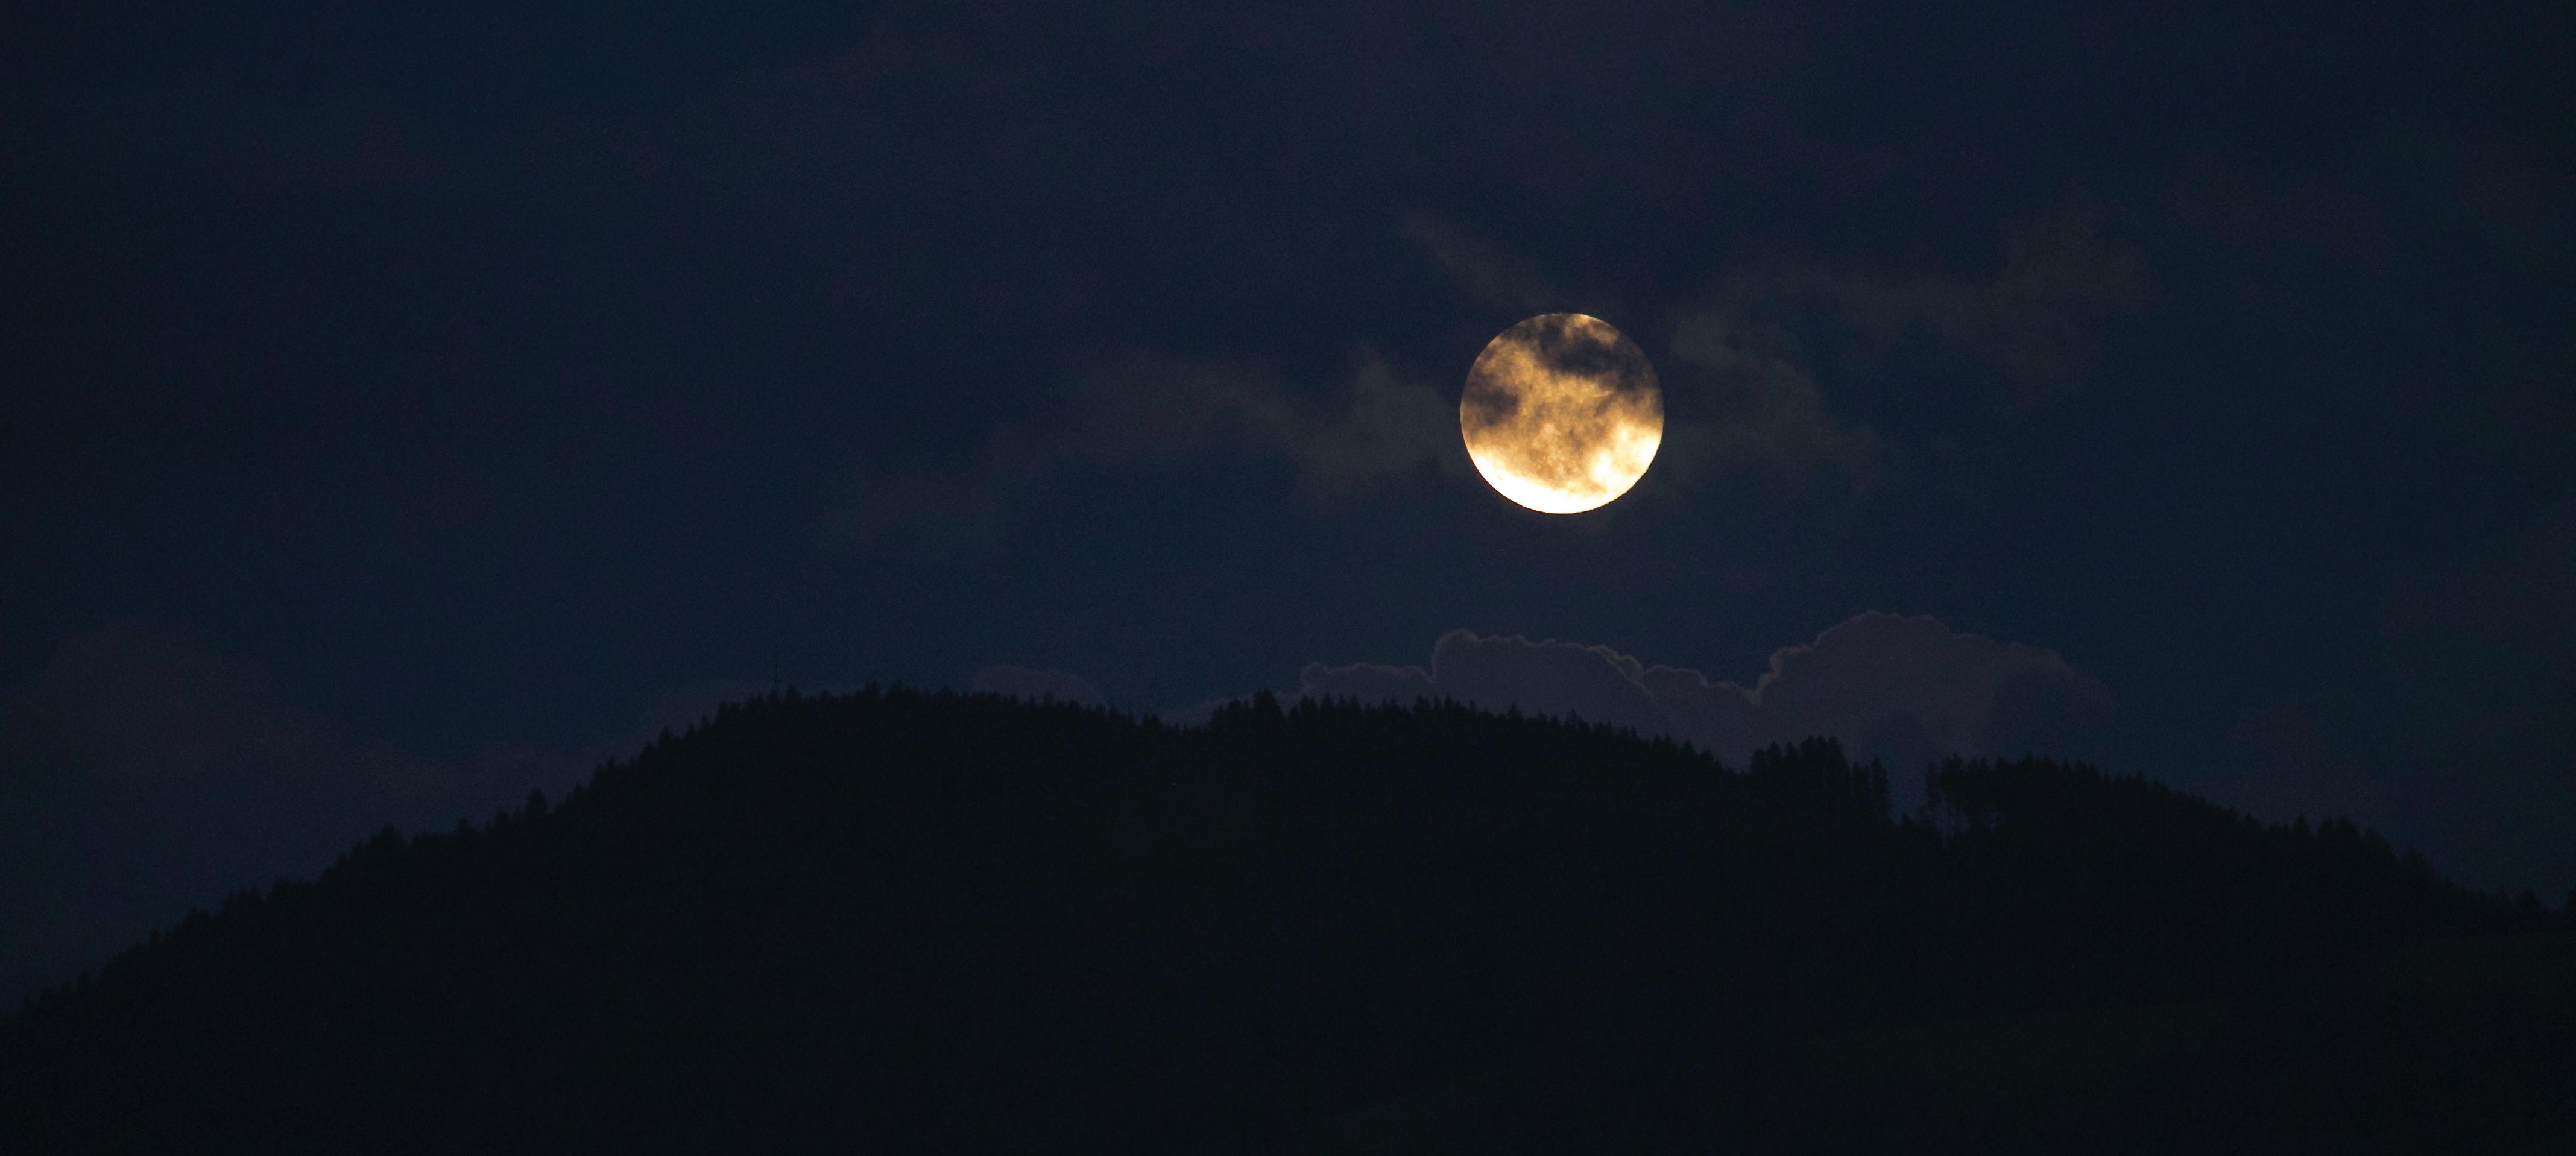 free stock photo of black wallpaper, dark, full moon